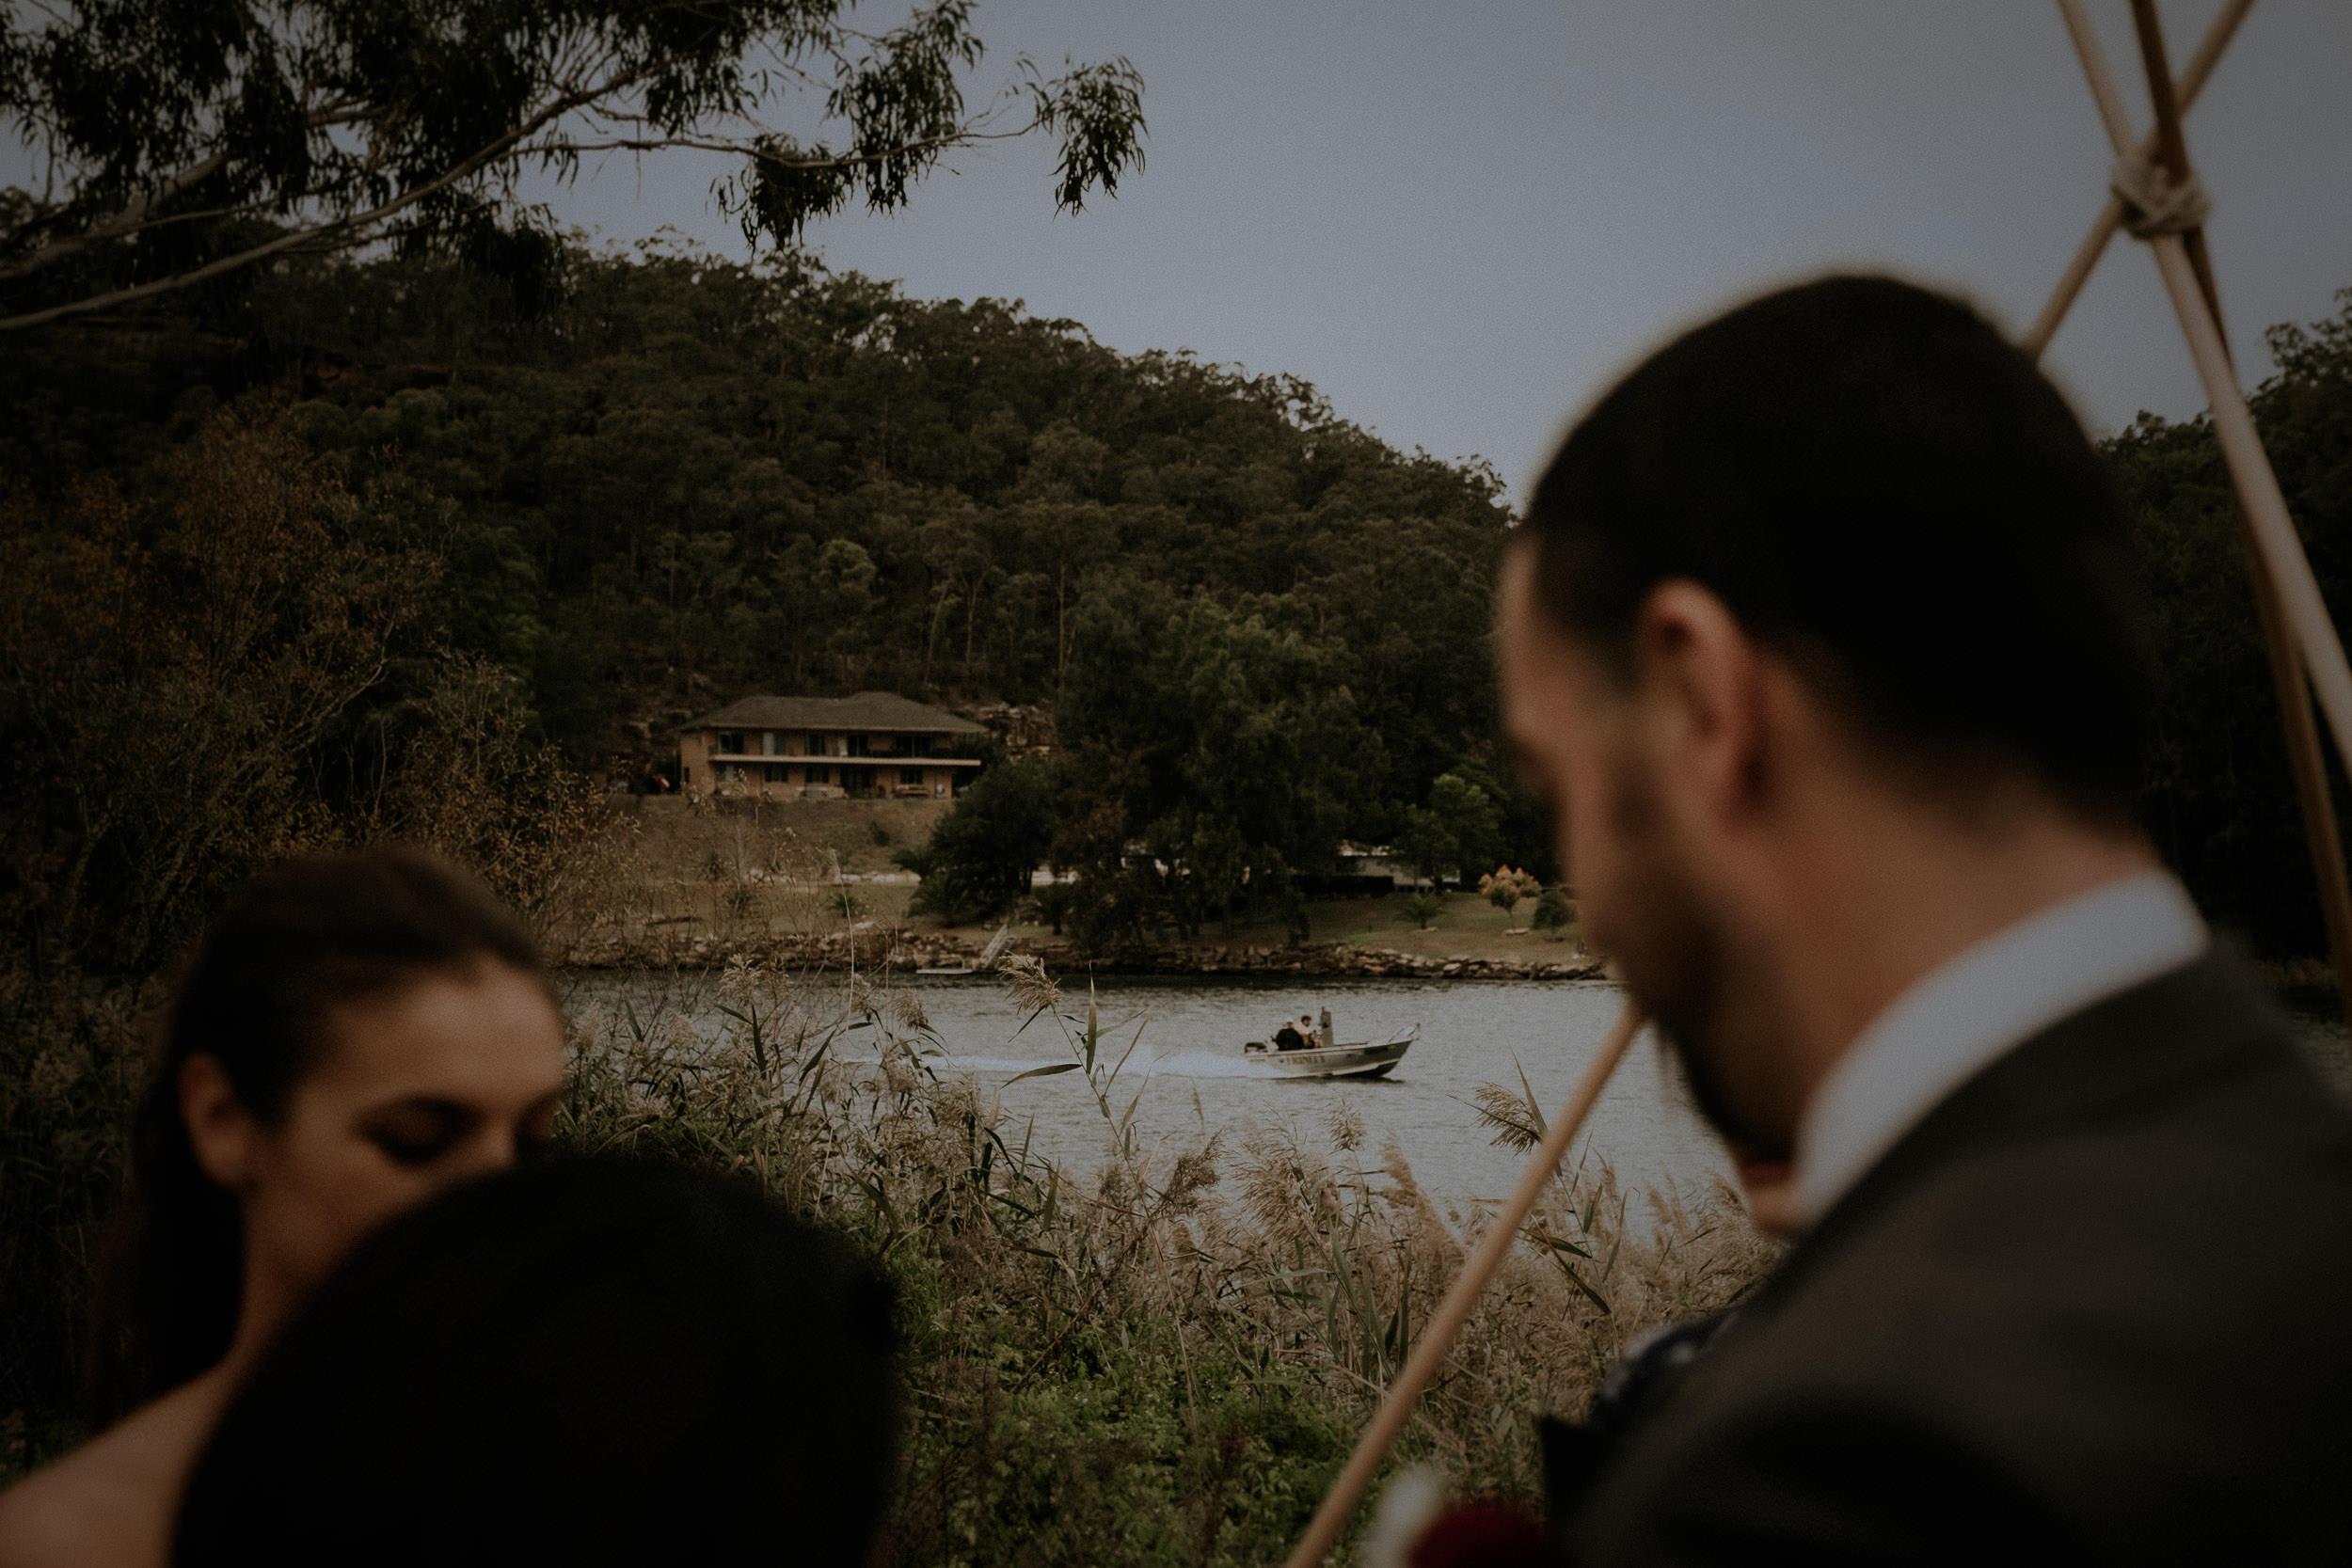 g_c wedding - kings _ thieves elopement wedding photography - blog 31.jpg